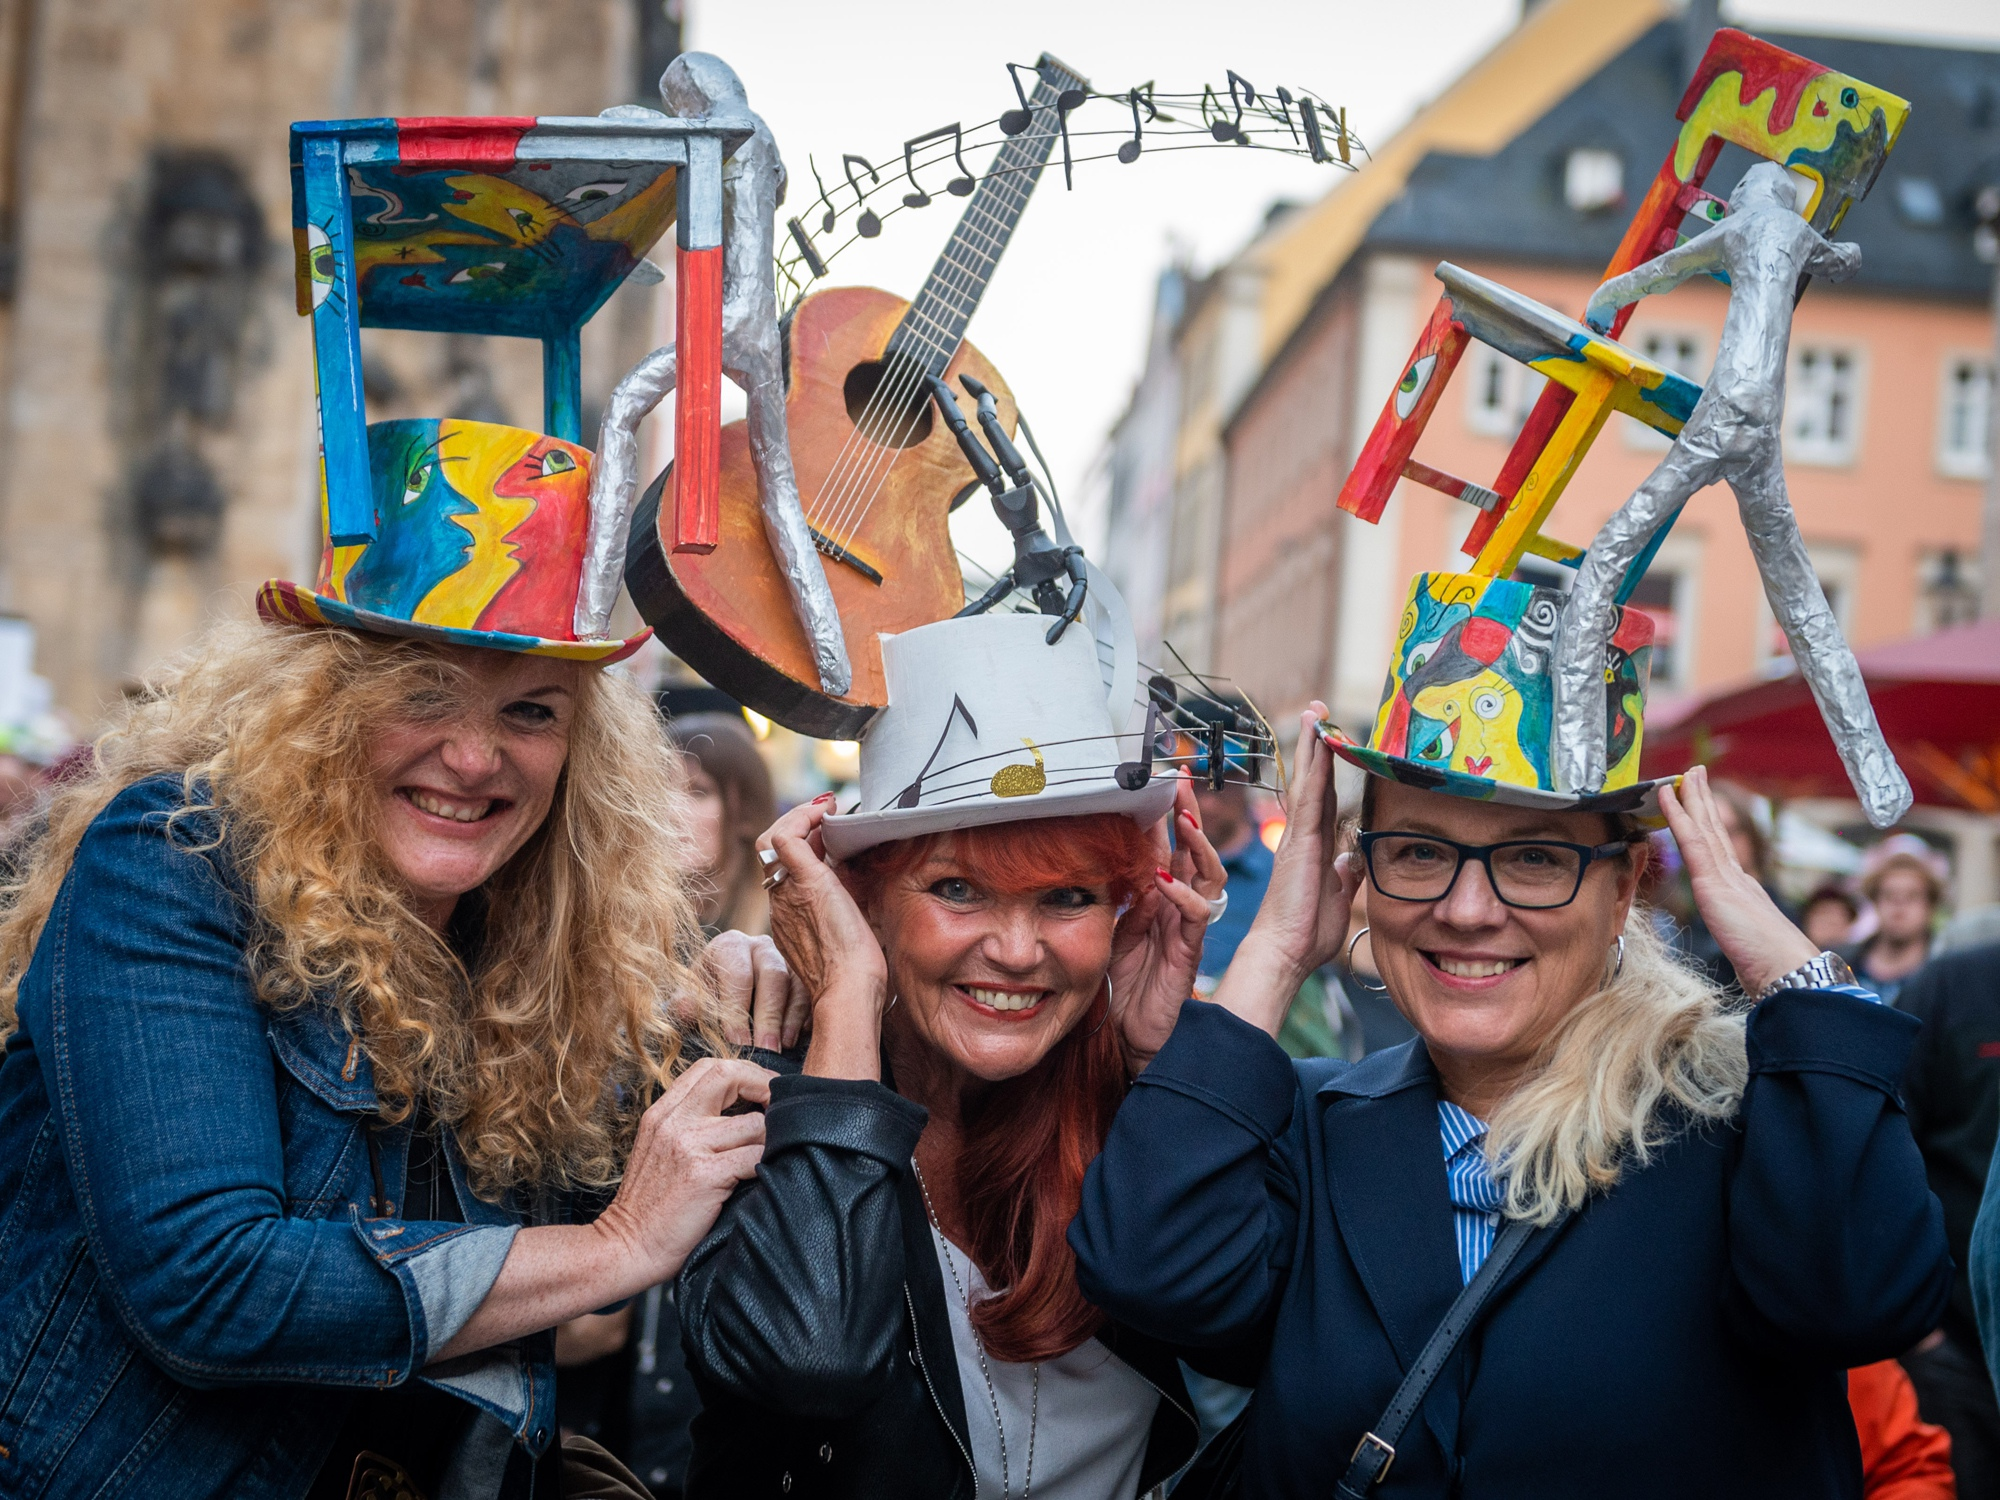 Ongekend Hutfestival Chemnitz | 22. - 24.5. 2020 | Festival der WI-69